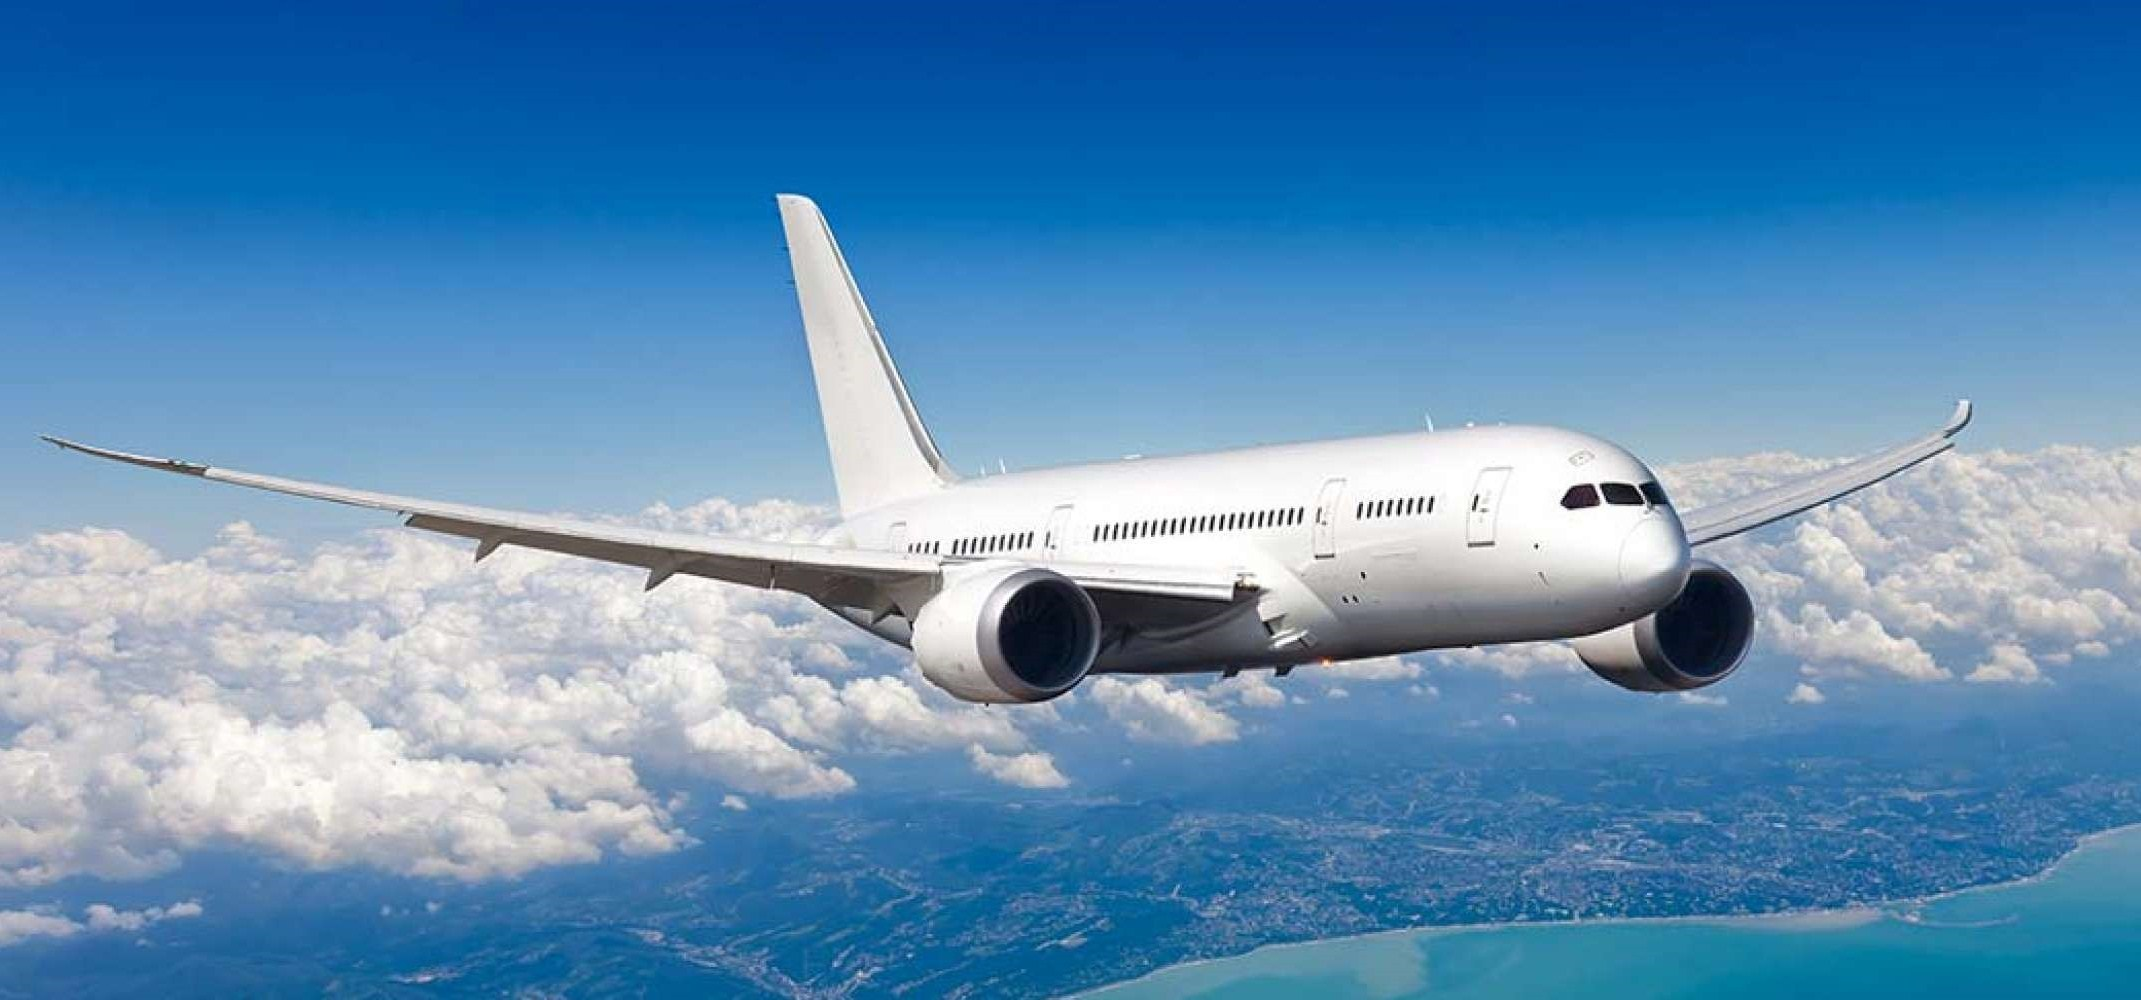 Image result for máy bay ít biết photos